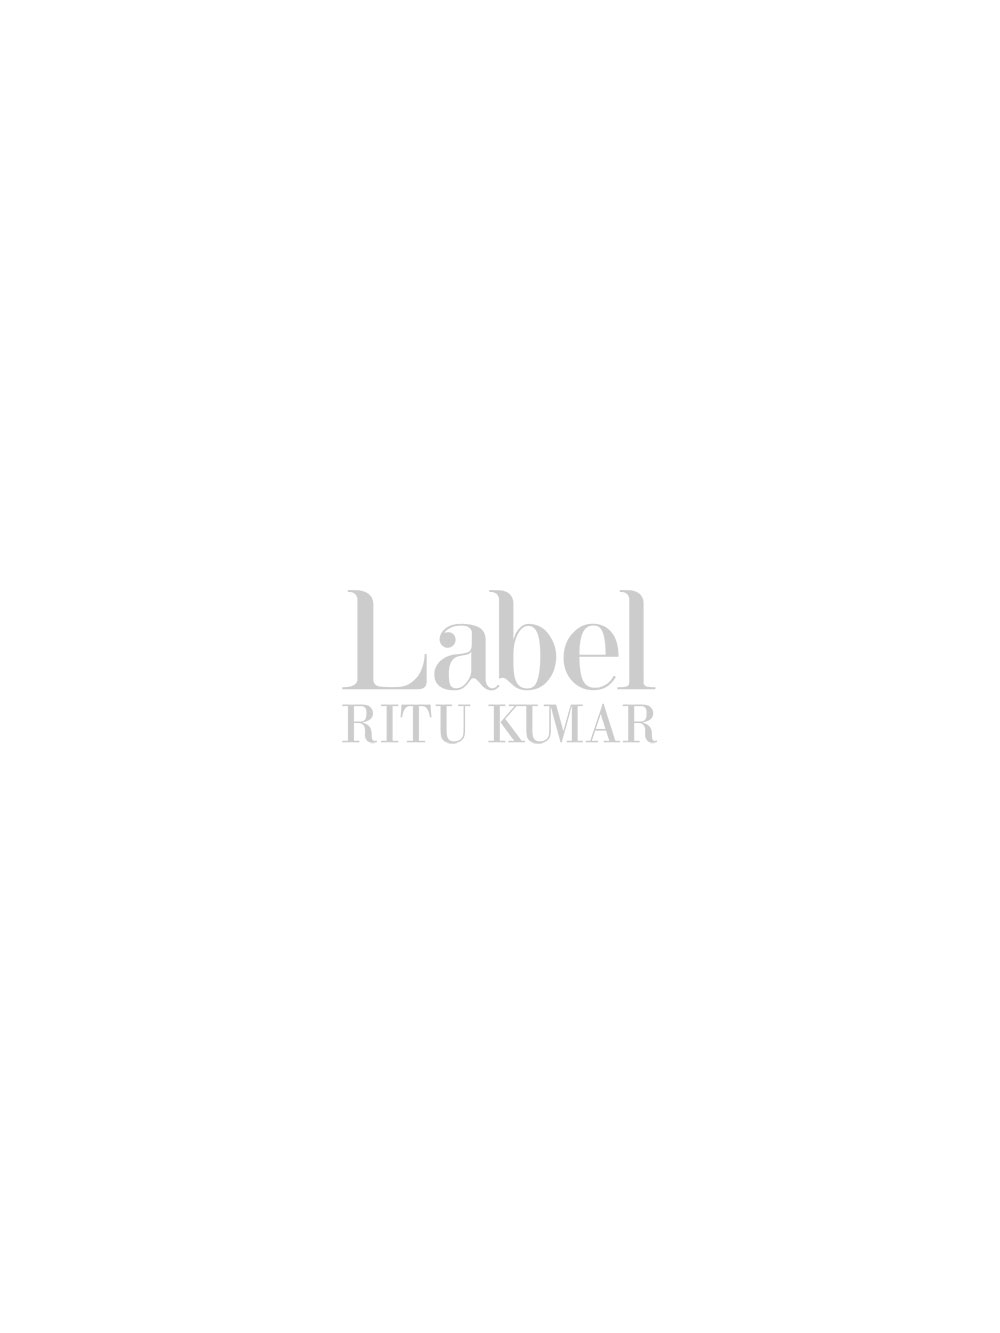 Designer Sheer Printed Summer Kaftan Dress